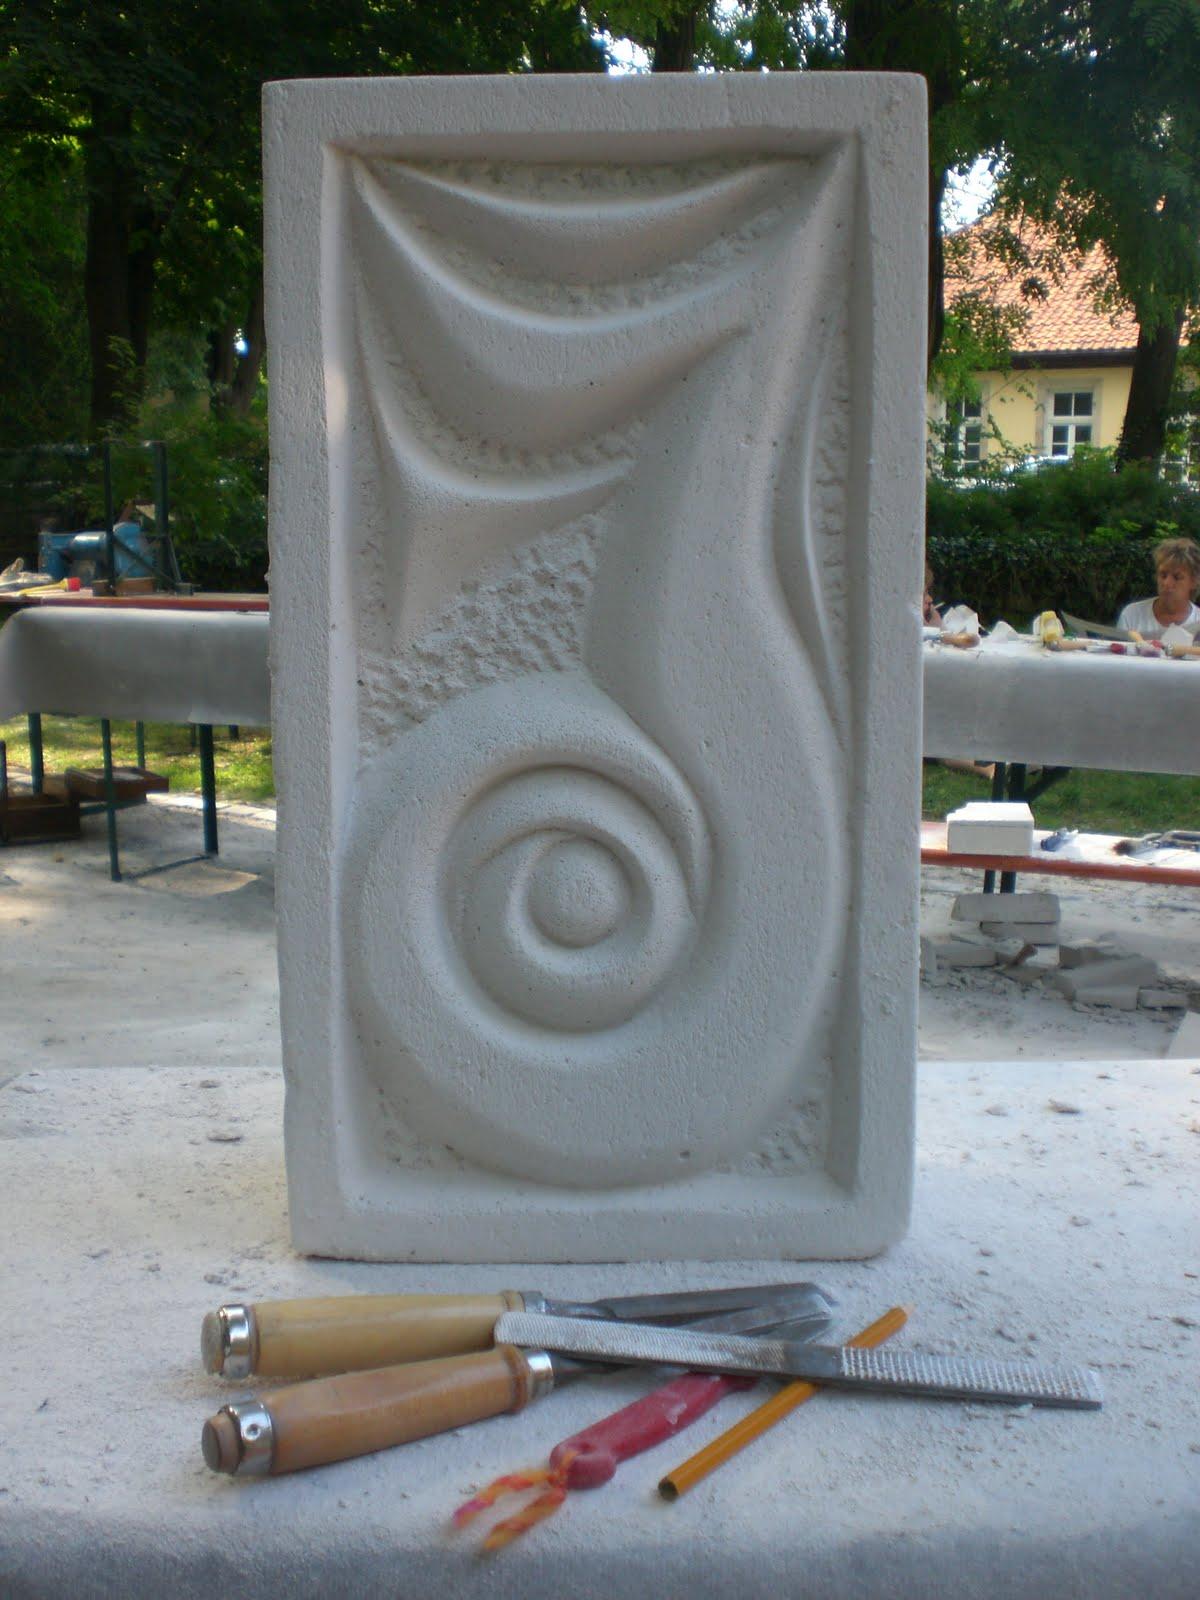 skulpturen ytong 2 ytong speckstein pinterest. Black Bedroom Furniture Sets. Home Design Ideas